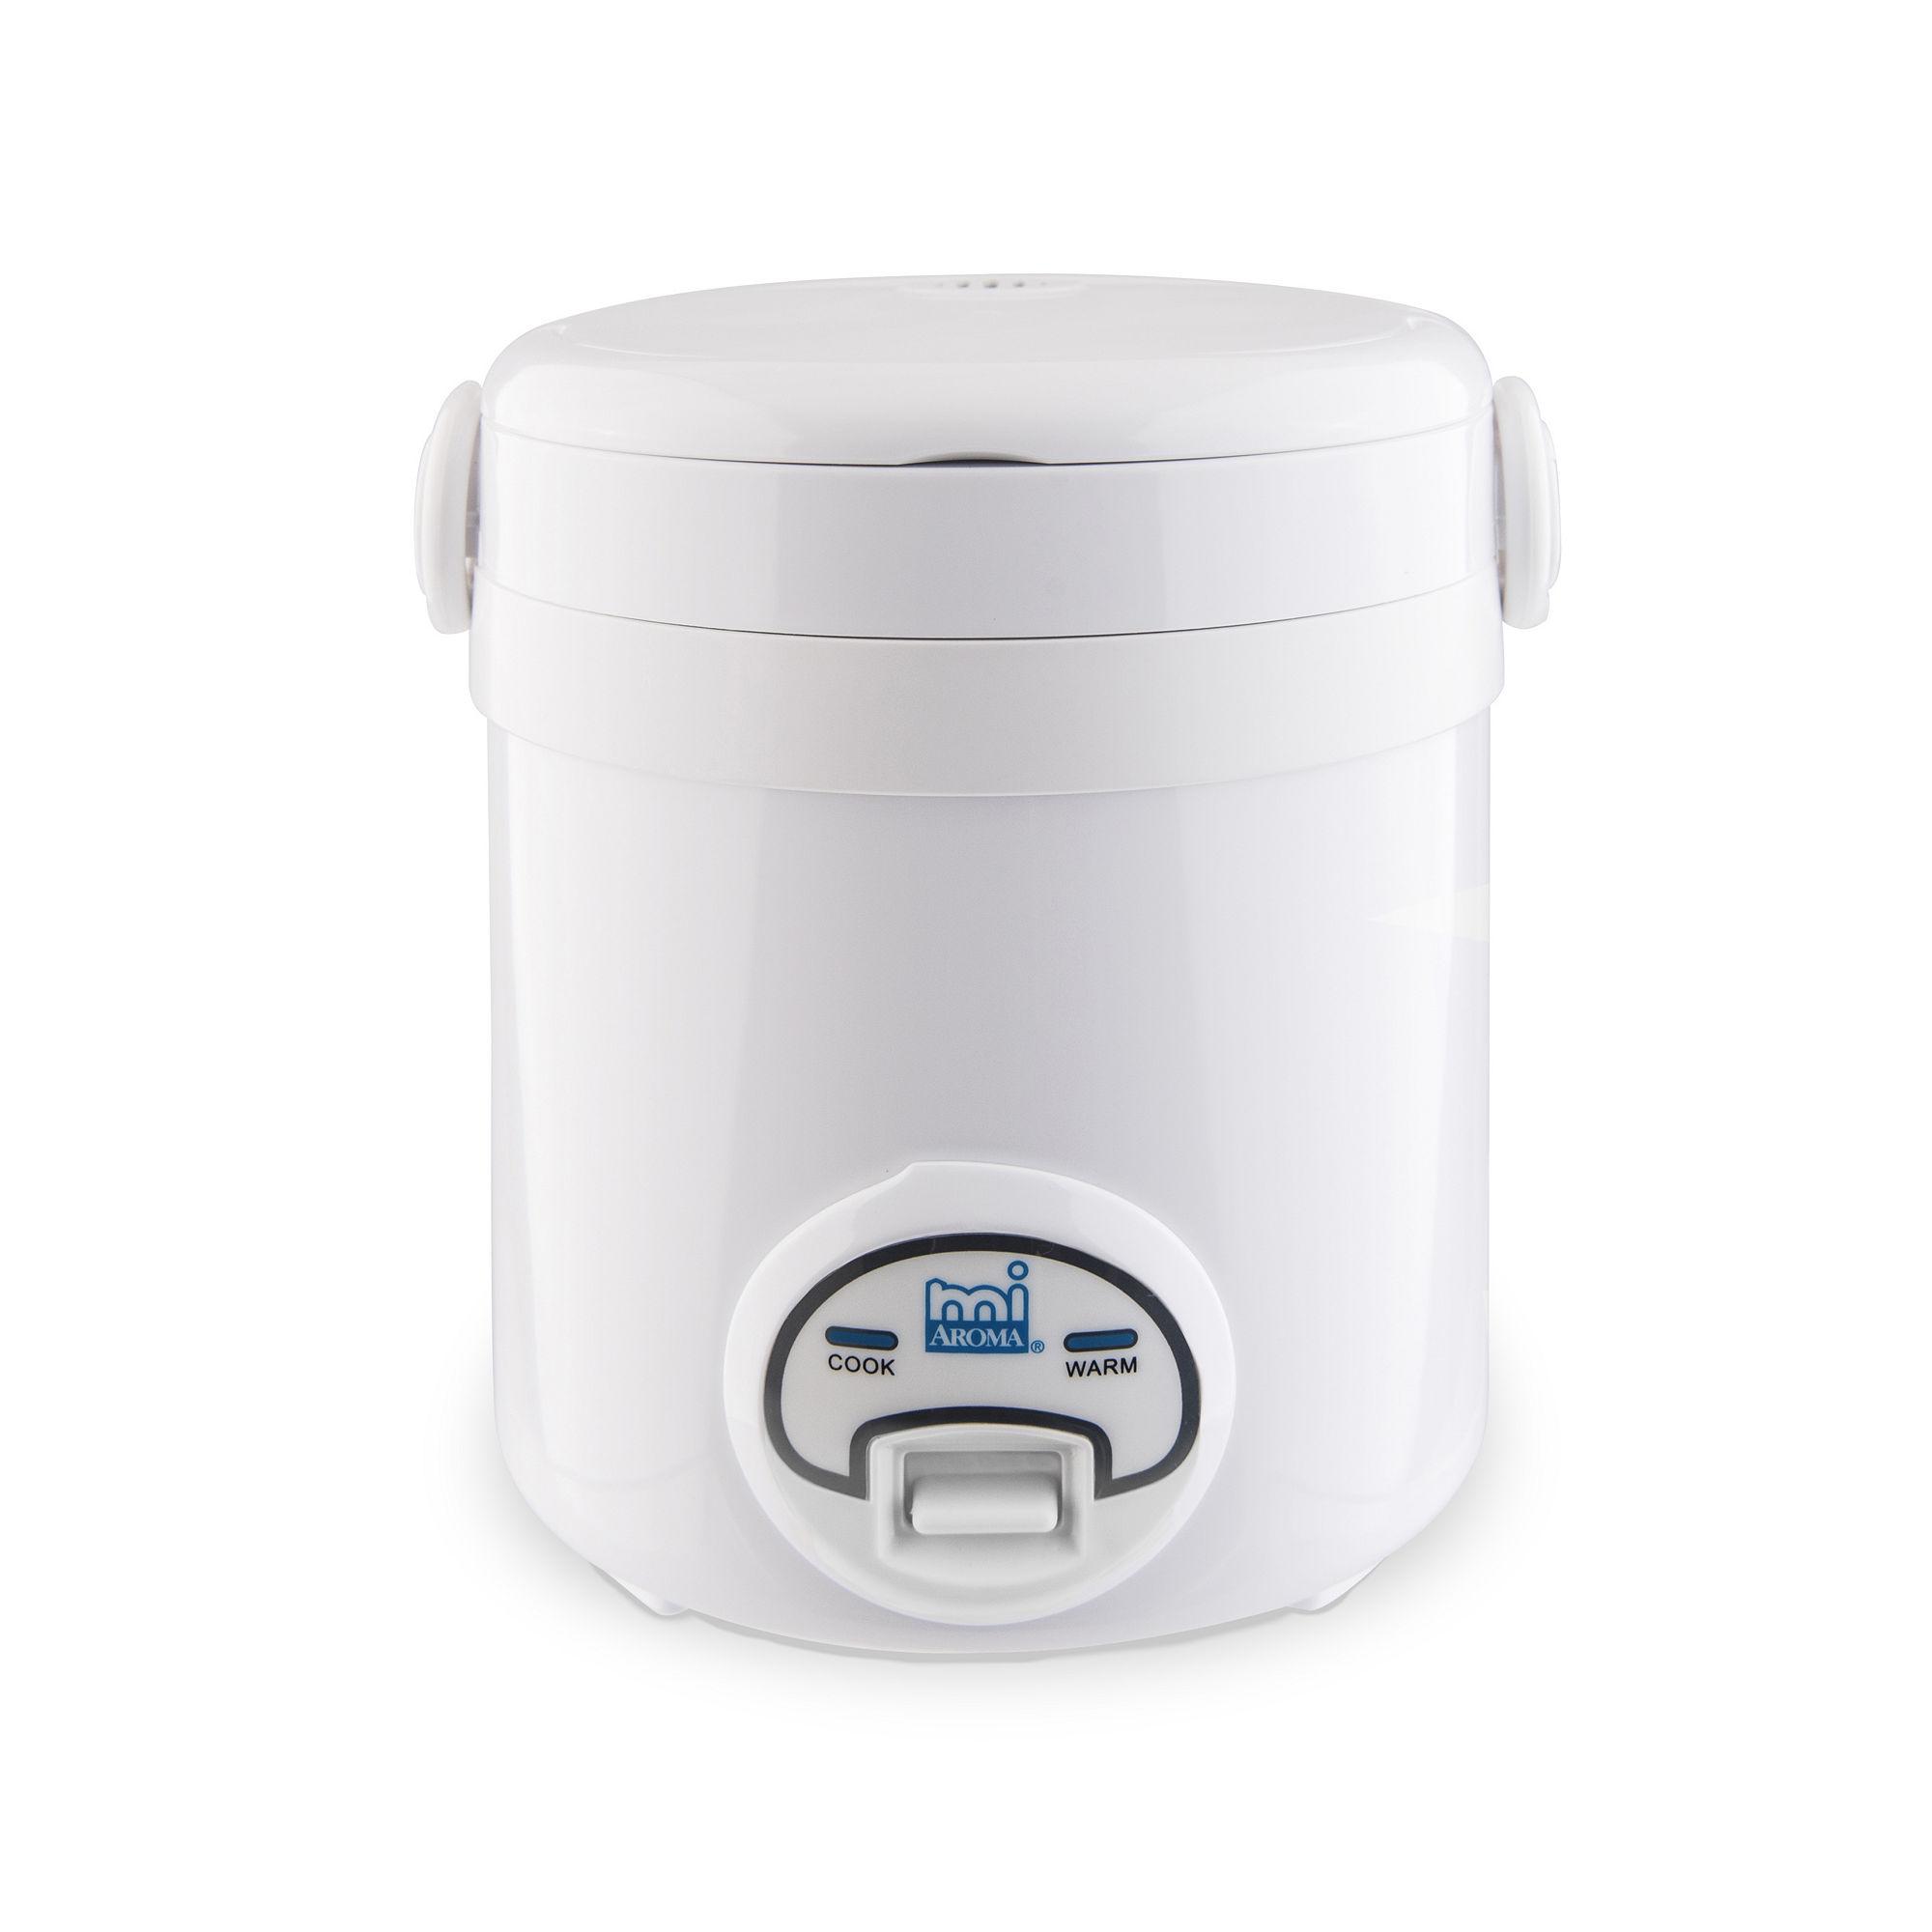 Aroma Mrc-903 Rice Cooker